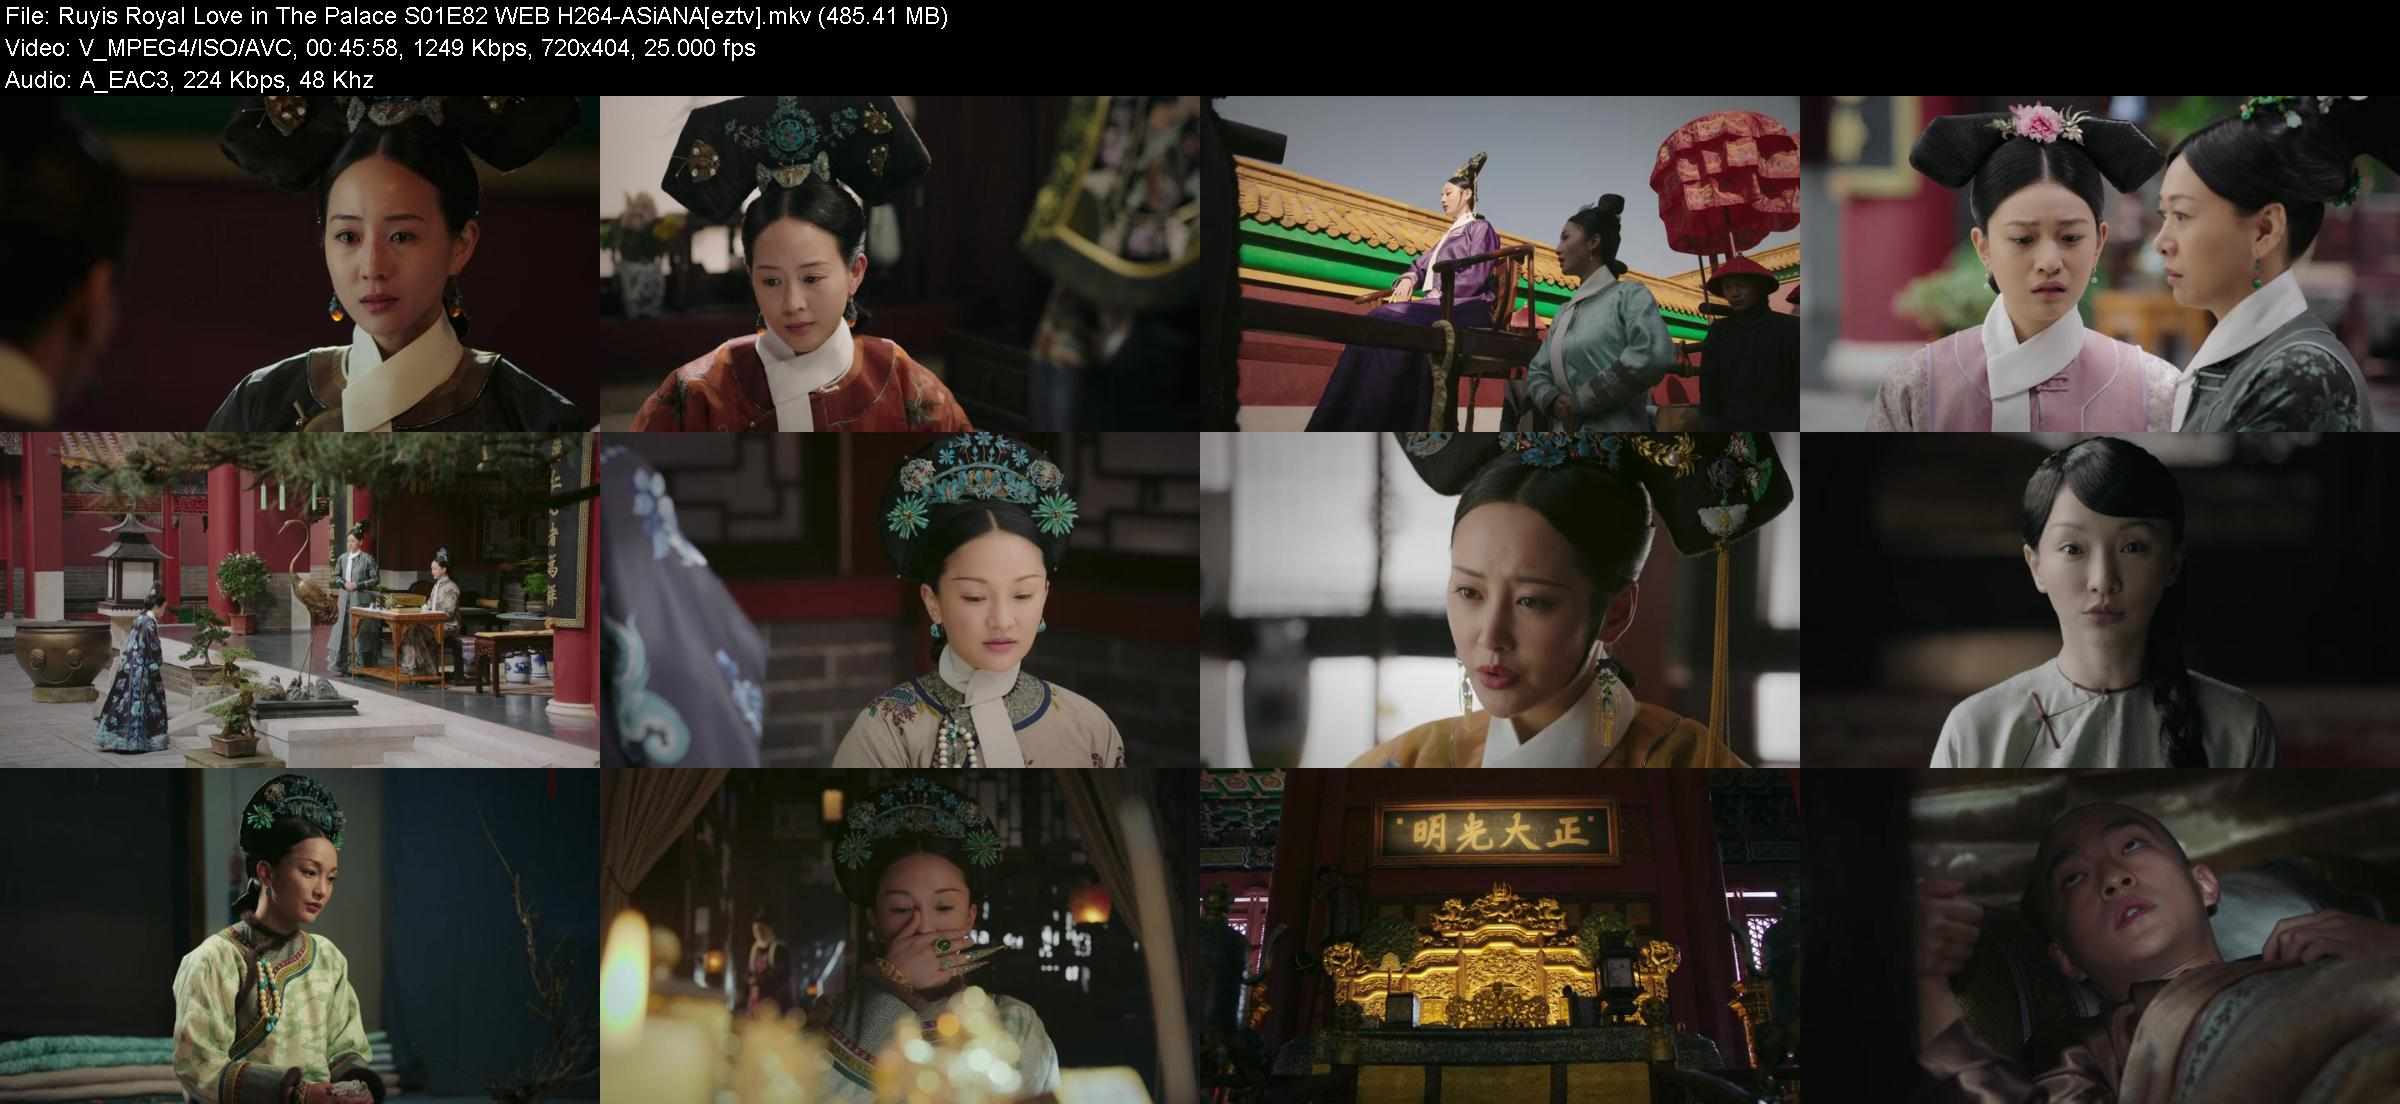 Ruyis Royal Love in The Palace S01E82 WEB H264-ASiANA